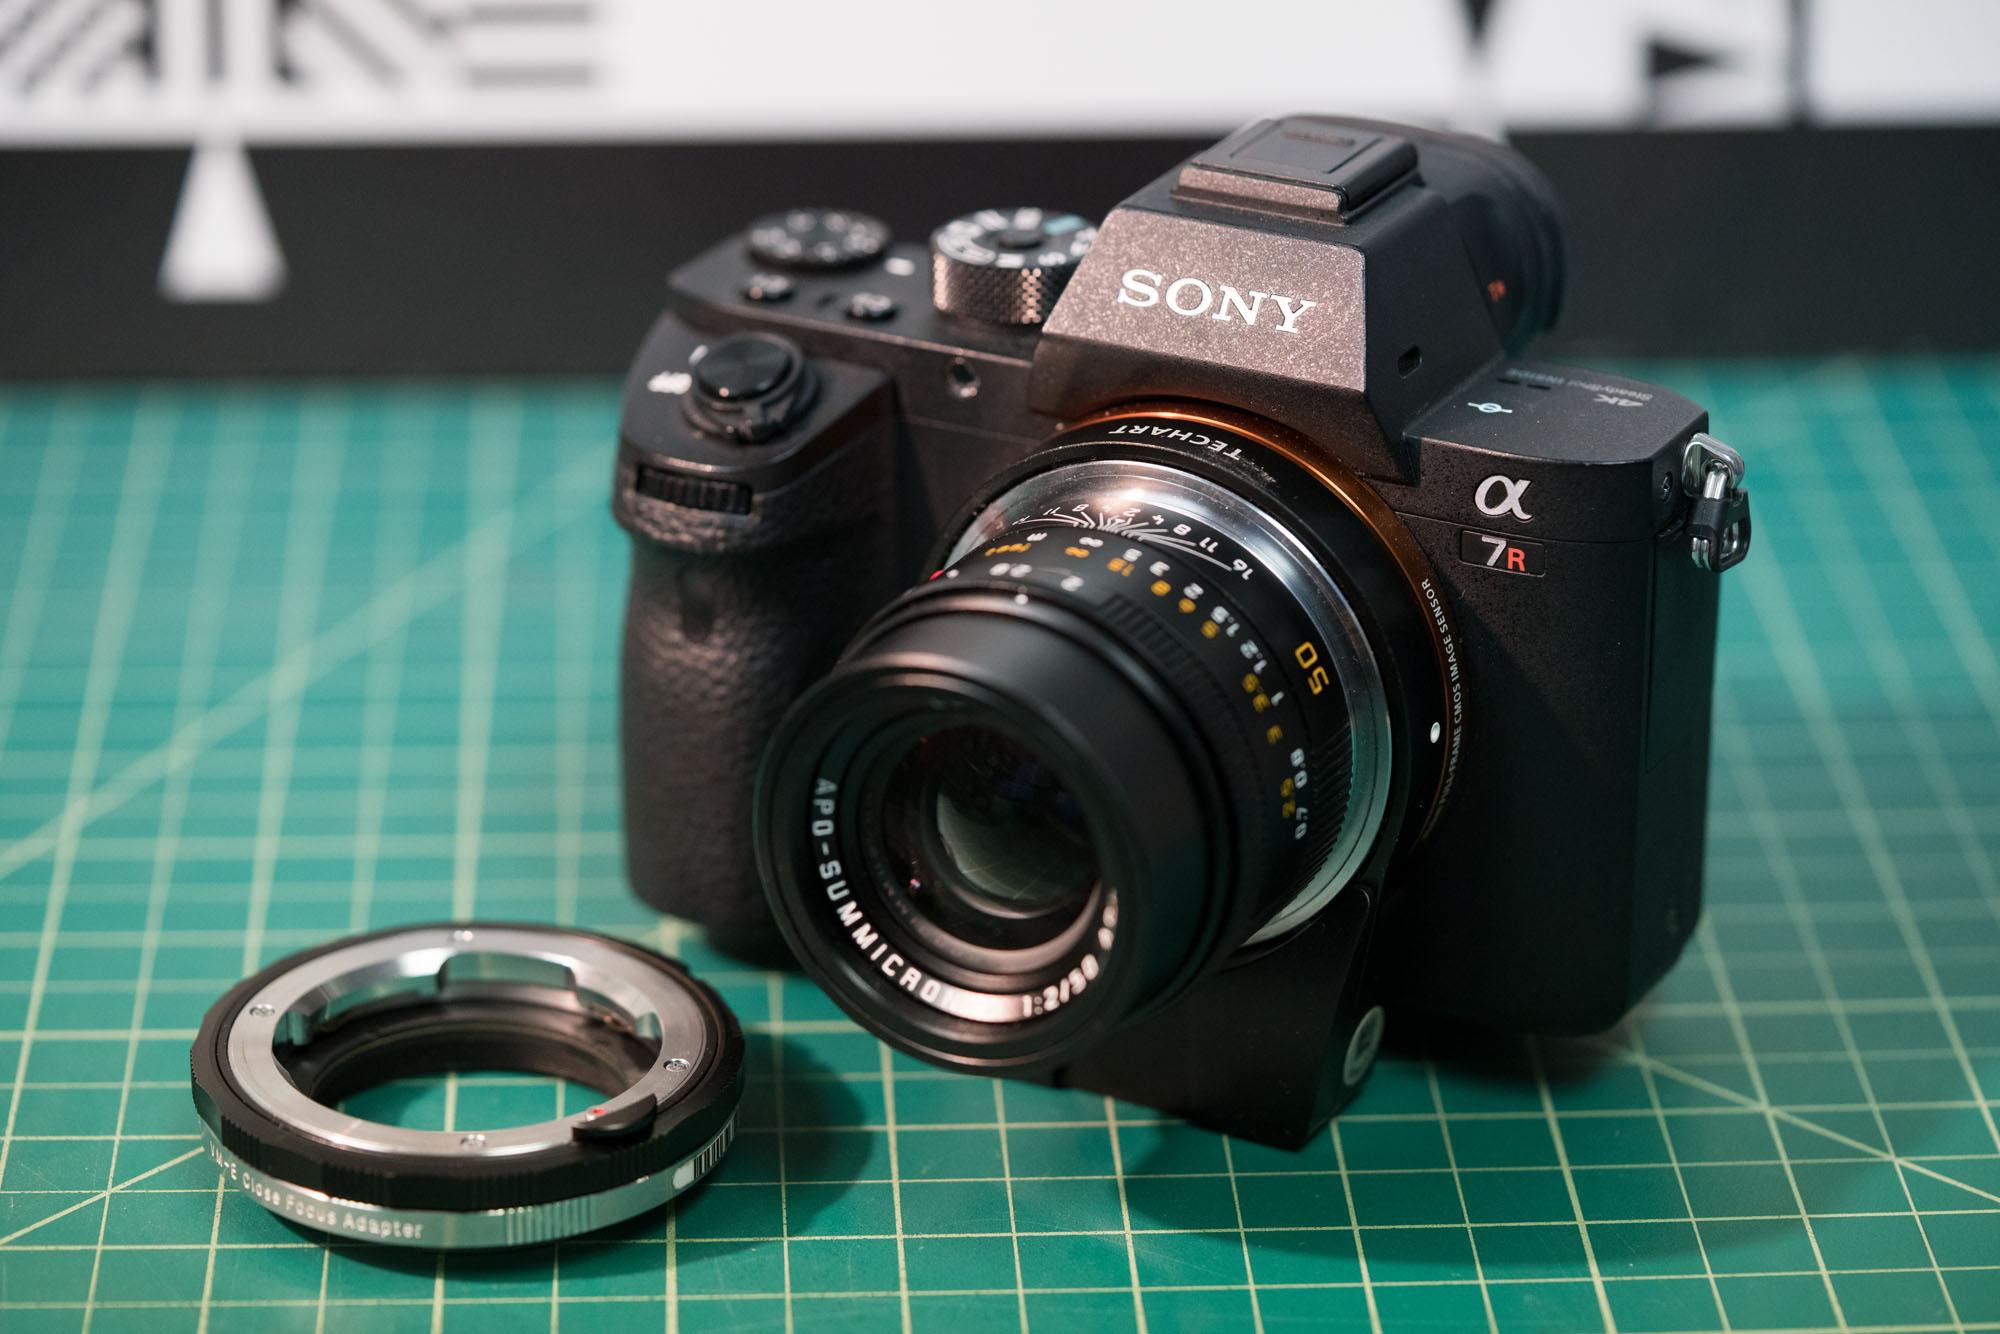 Wondrous Aperture Control Nikon To Canon Eos Lens Adapter Techart Adapter Lens Rentals Blog Nikon To Canon Lens Adapter dpreview Nikon To Canon Lens Adapter